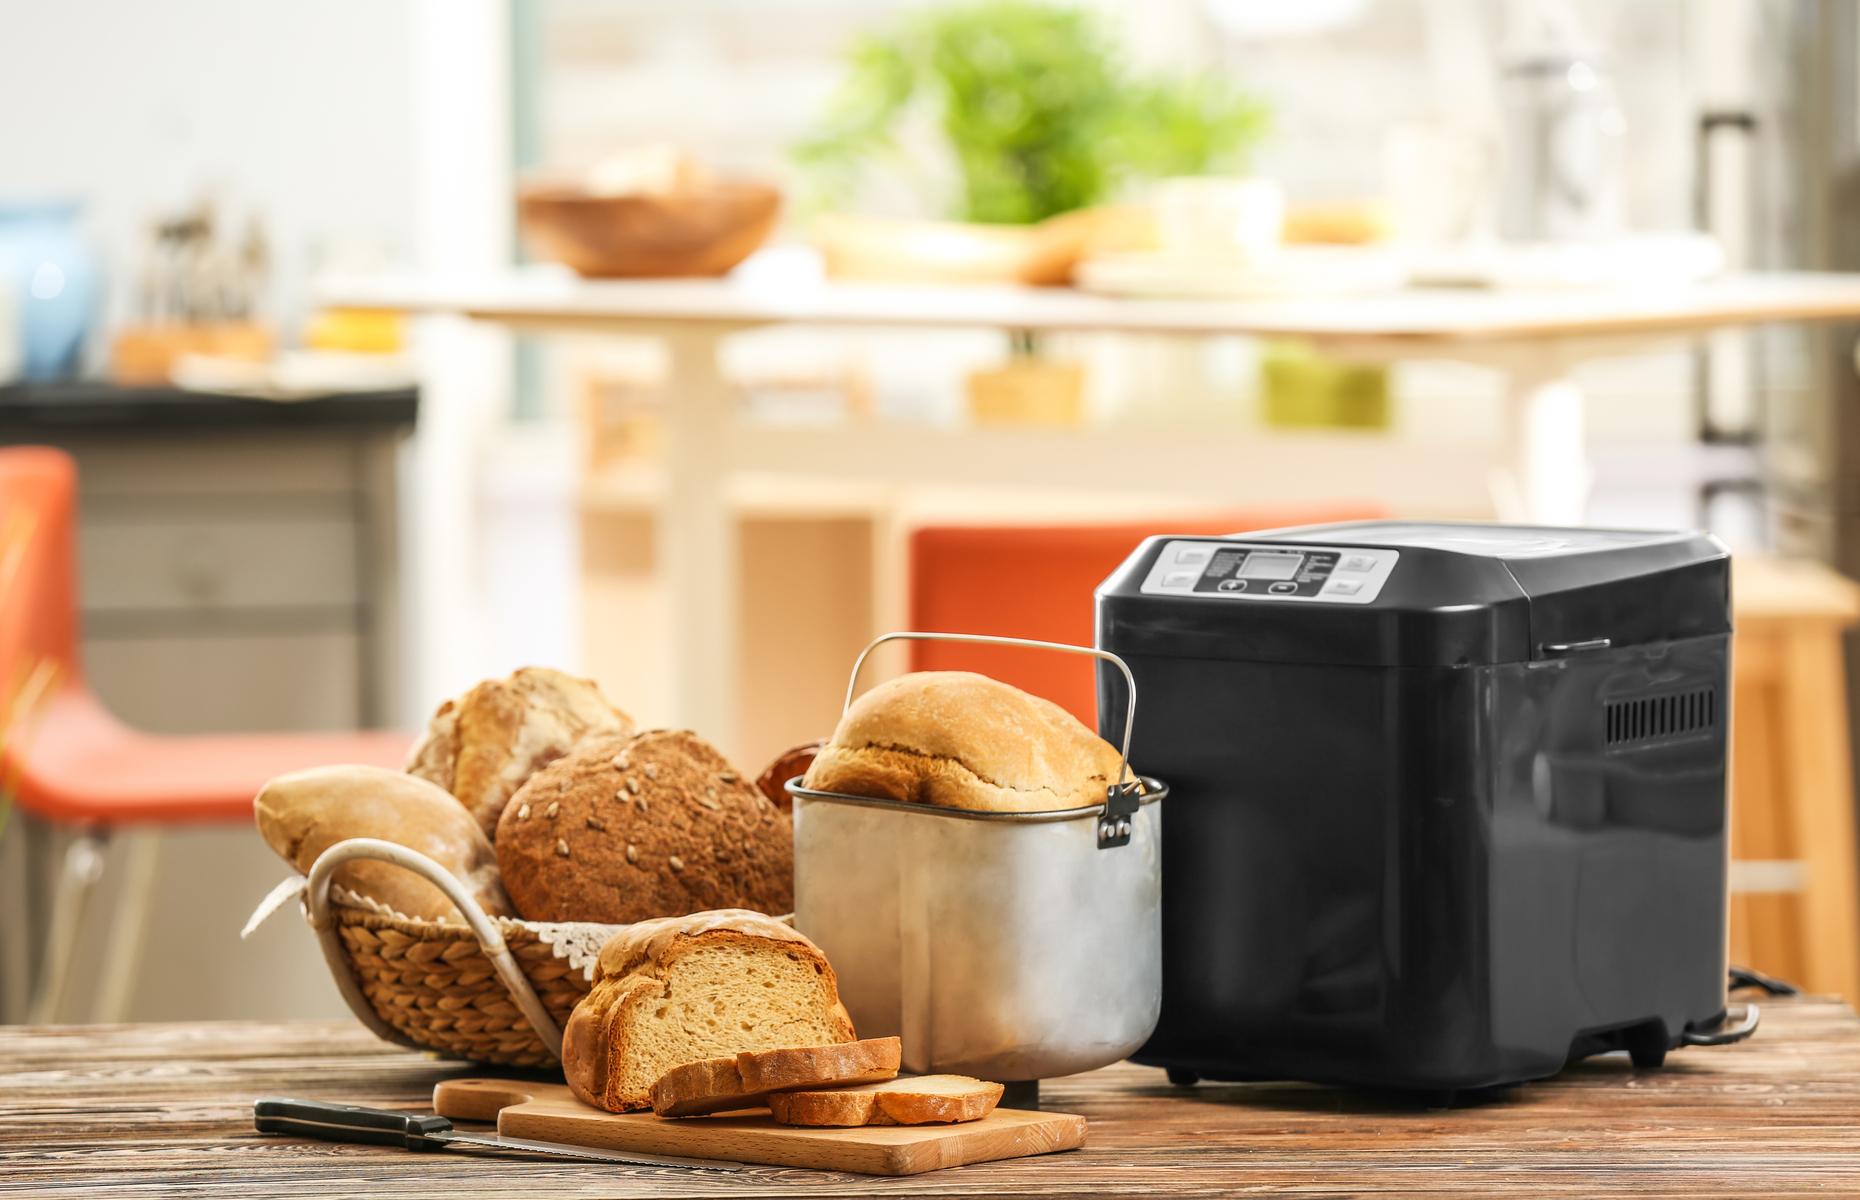 Bread-making machine (Image: Africa Studio/Shutterstock)